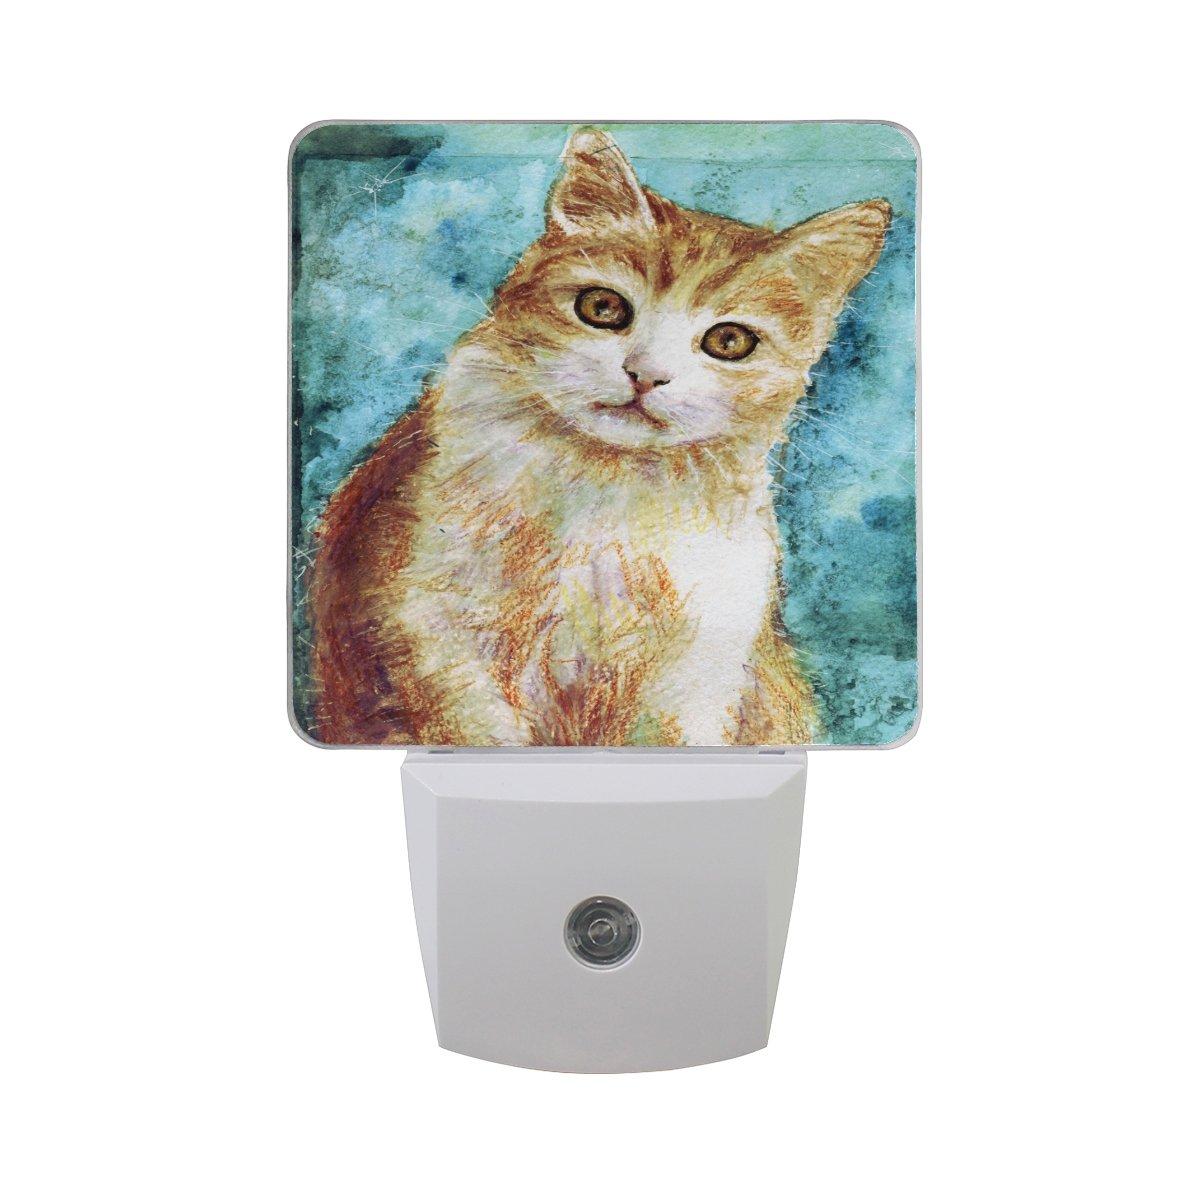 Alaza水彩かわいい猫プラグインLED Dusk to Dawnセンサーナイトライト、cool-touchデザイン壁階段用ライト寝室キッチン、廊下、または任意暗い部屋 B07CH3H93K 16045